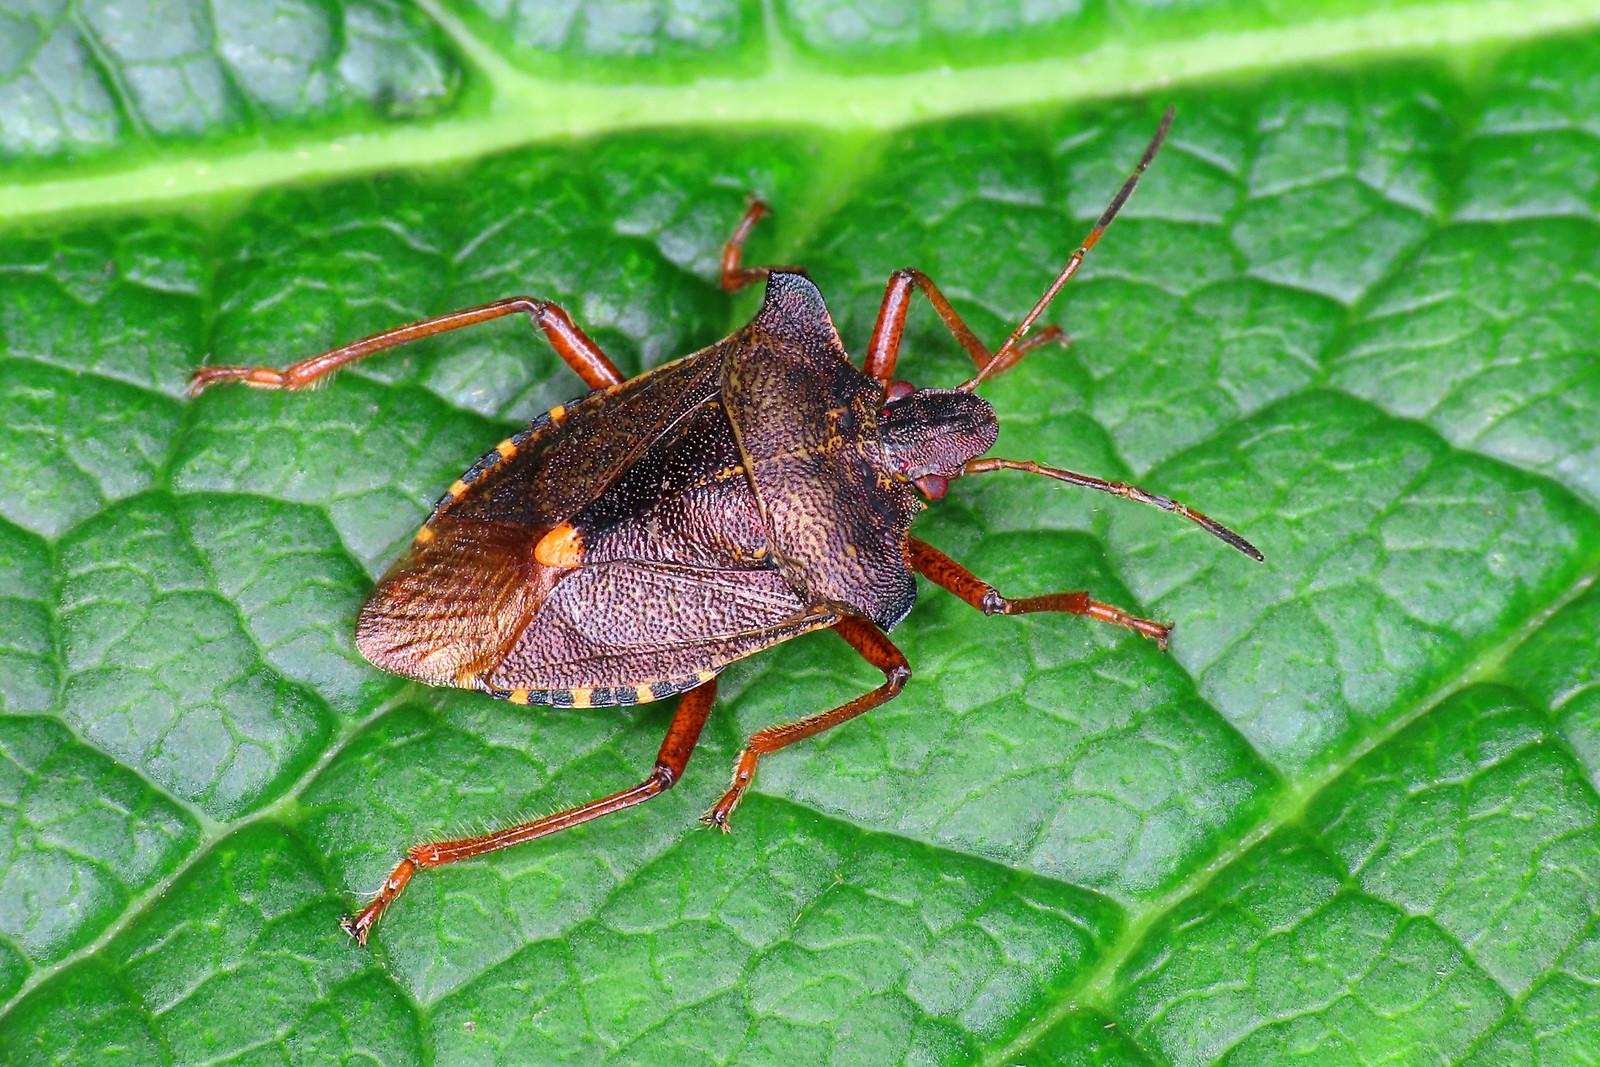 Red-legged Shieldbug - Pentatoma rufipes [A]